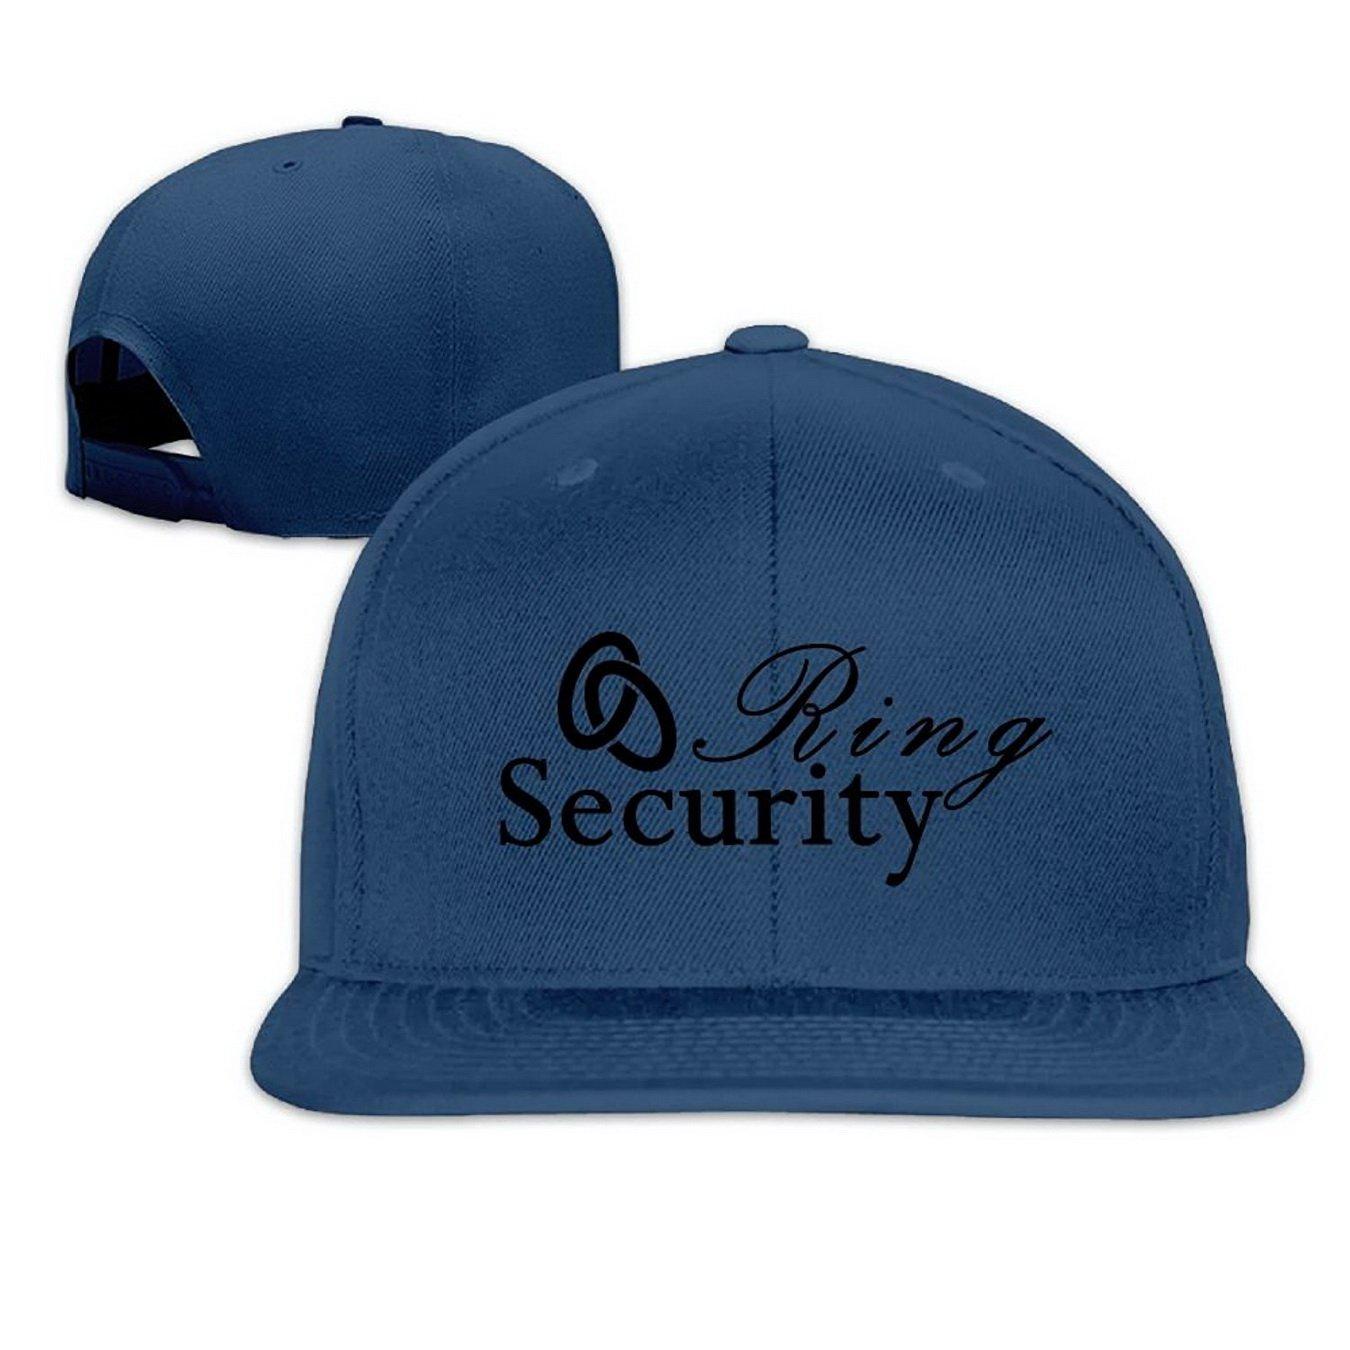 Ring Security Snapback Hip Hop Flat Bill Baseball Caps for Men Women Navy